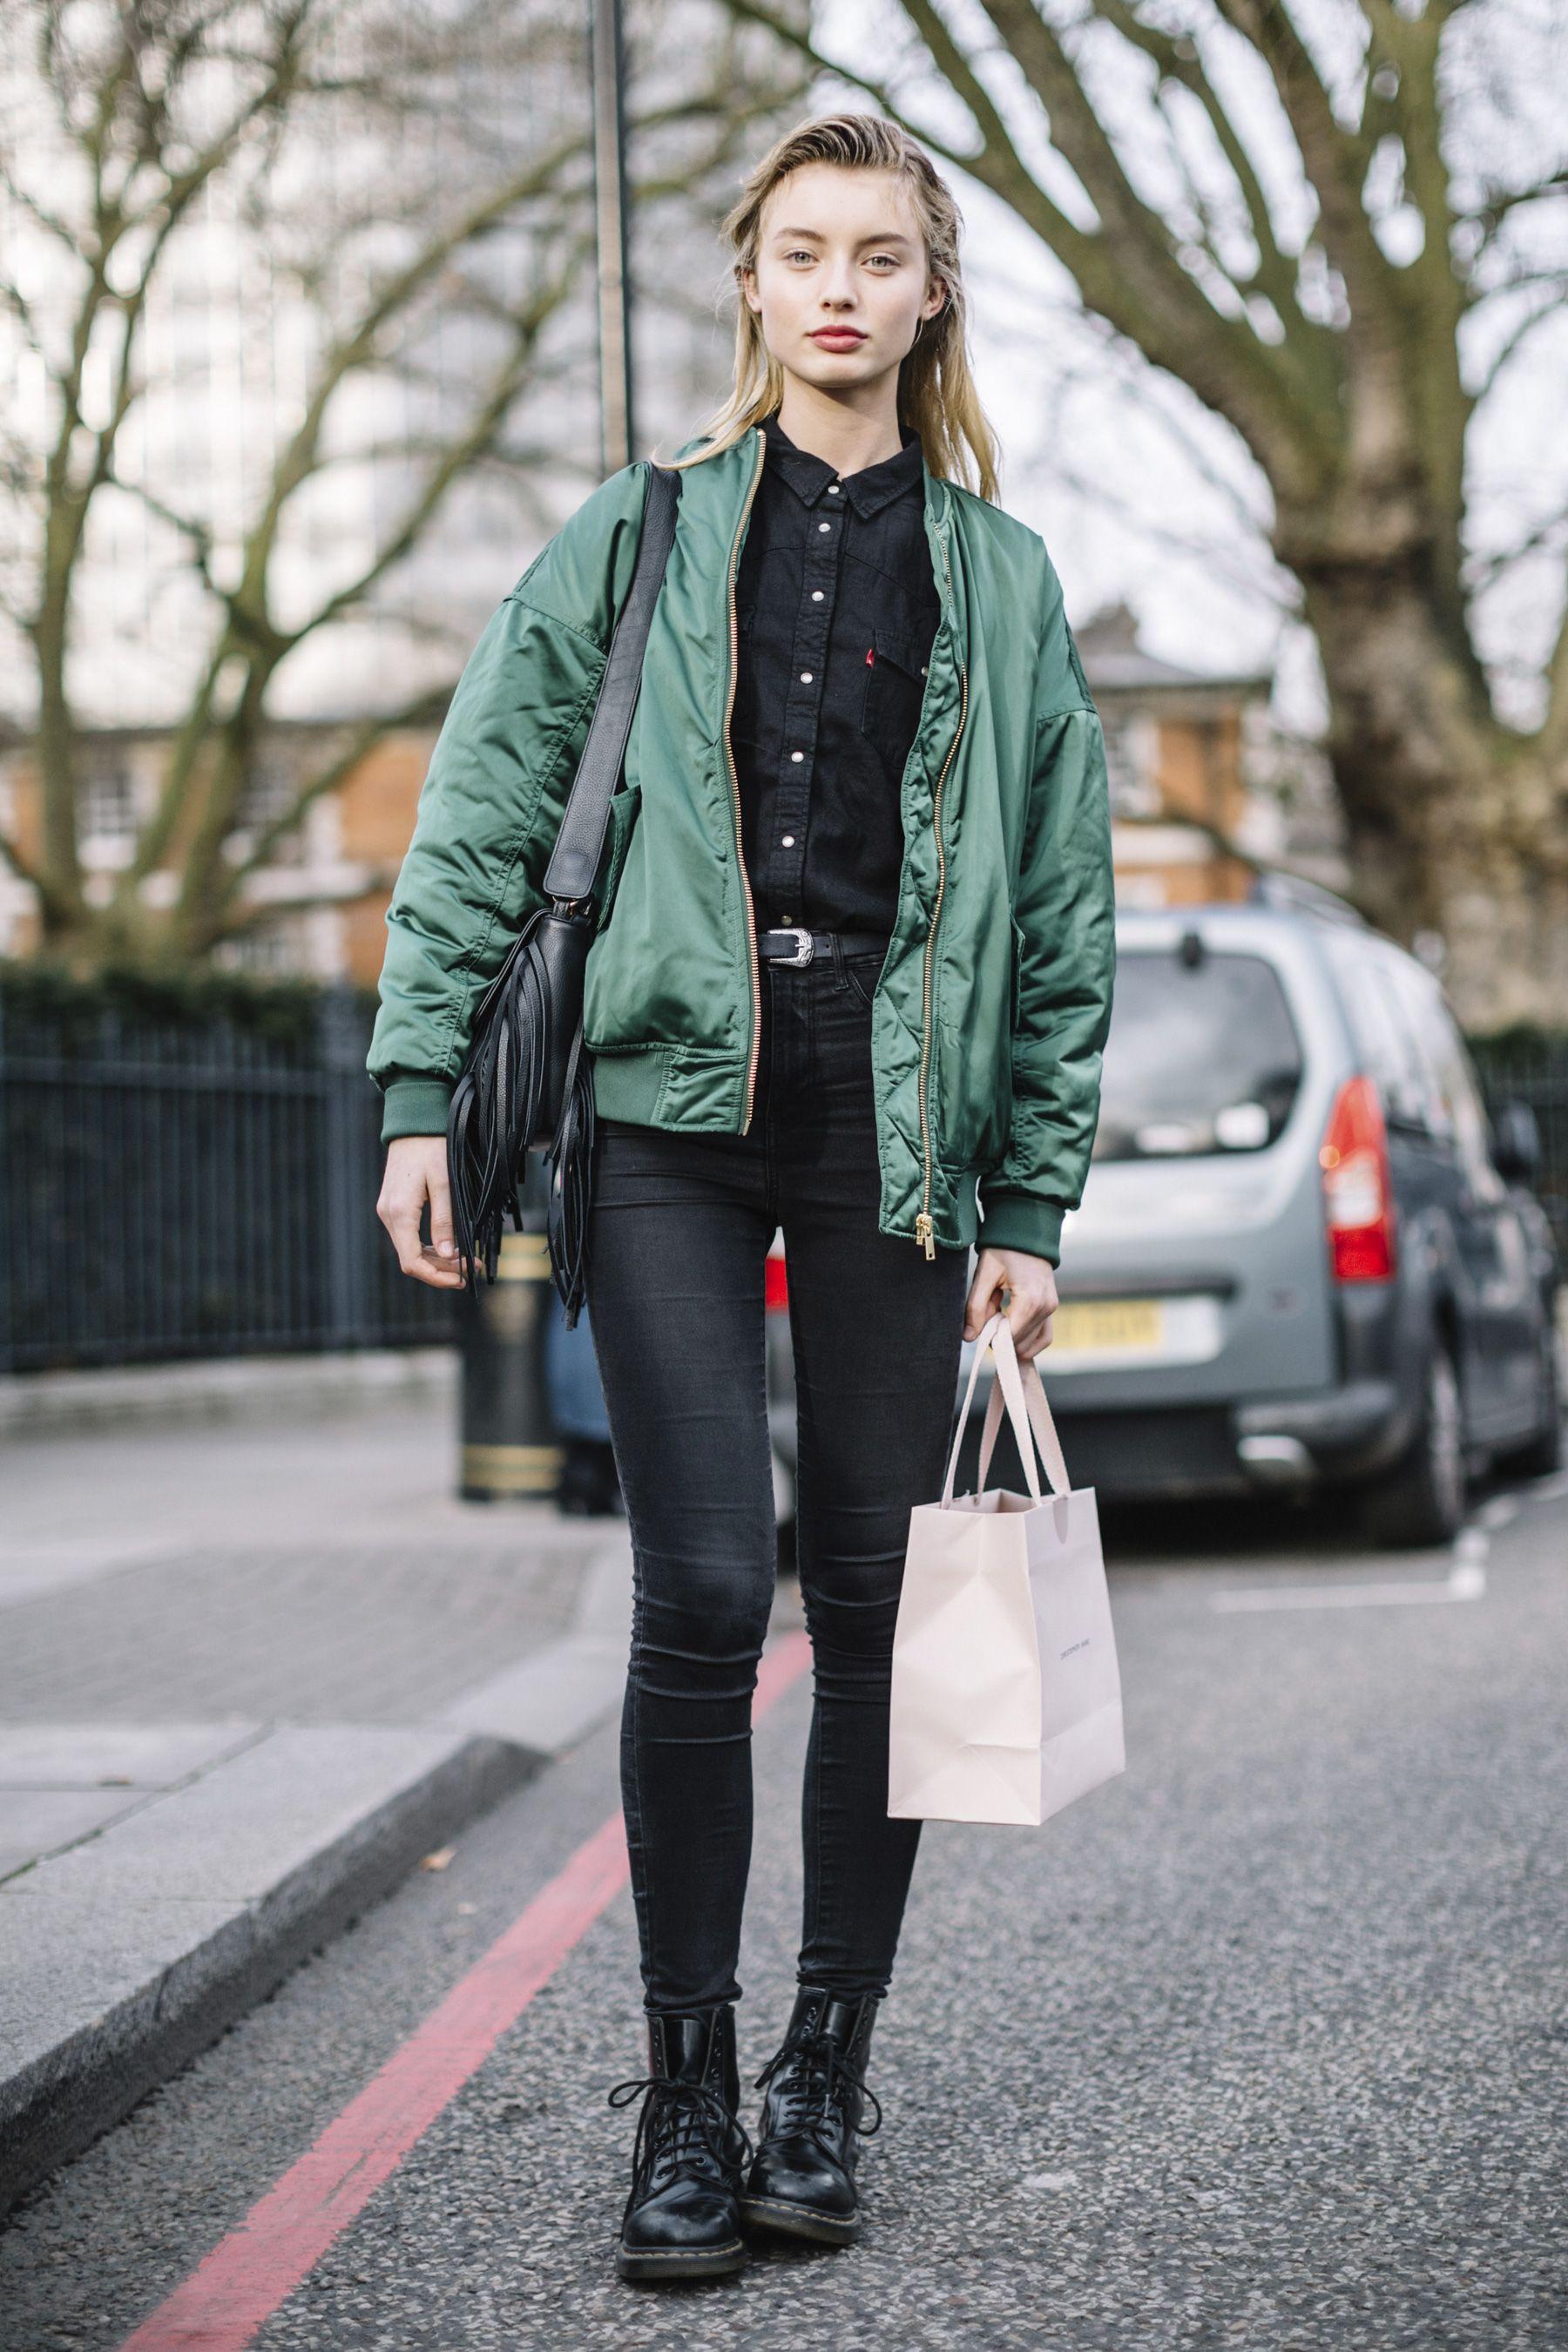 Fashion london week fall models off duty photo